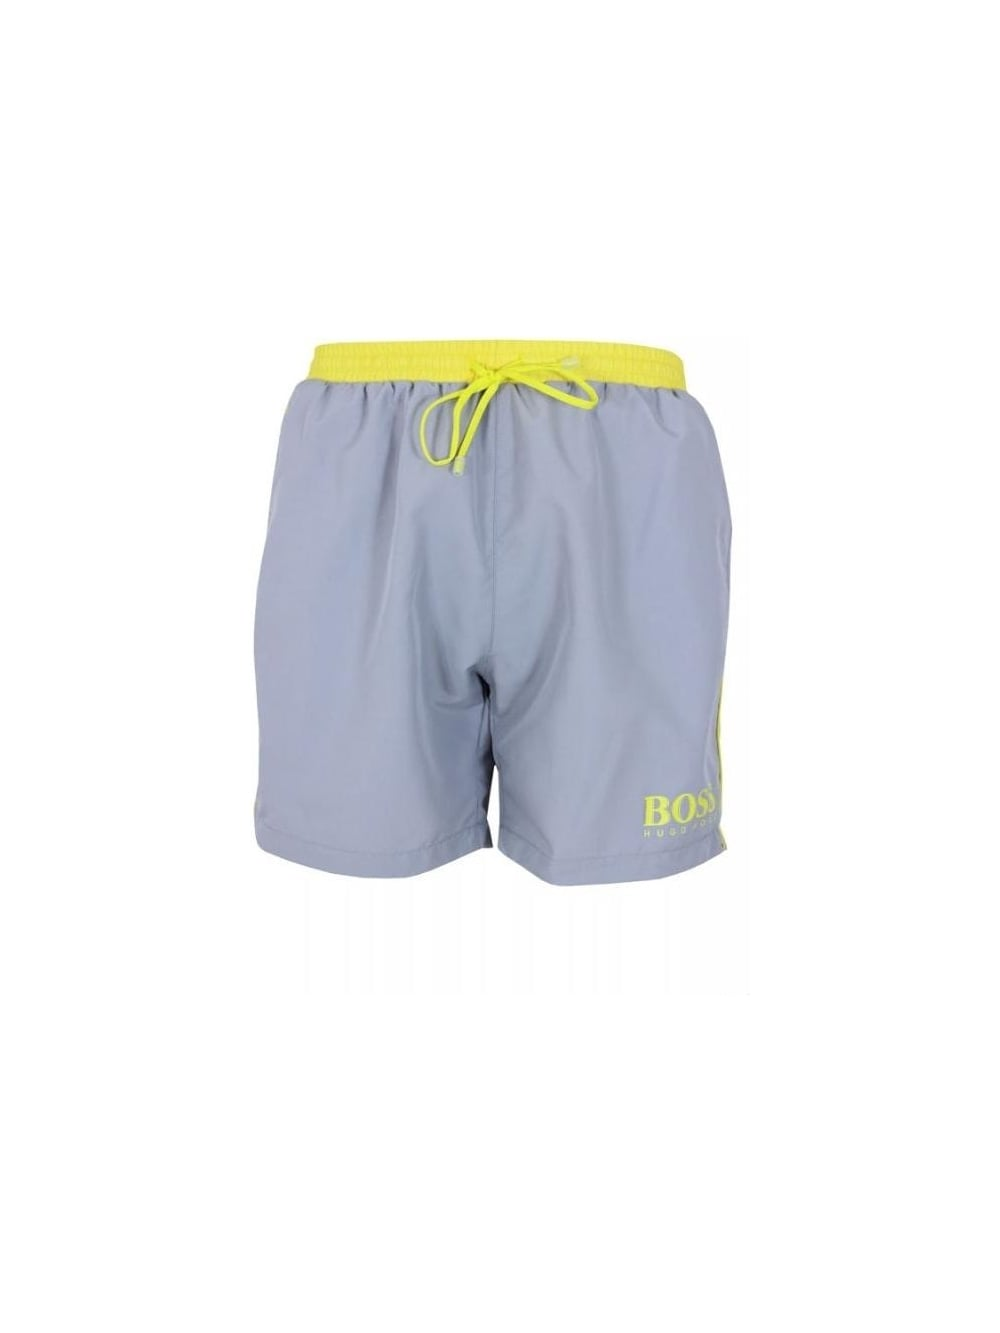 67912b9a07 HUGO BOSS Black Bodywear Starfish Swim Shorts in Silver - Northern ...